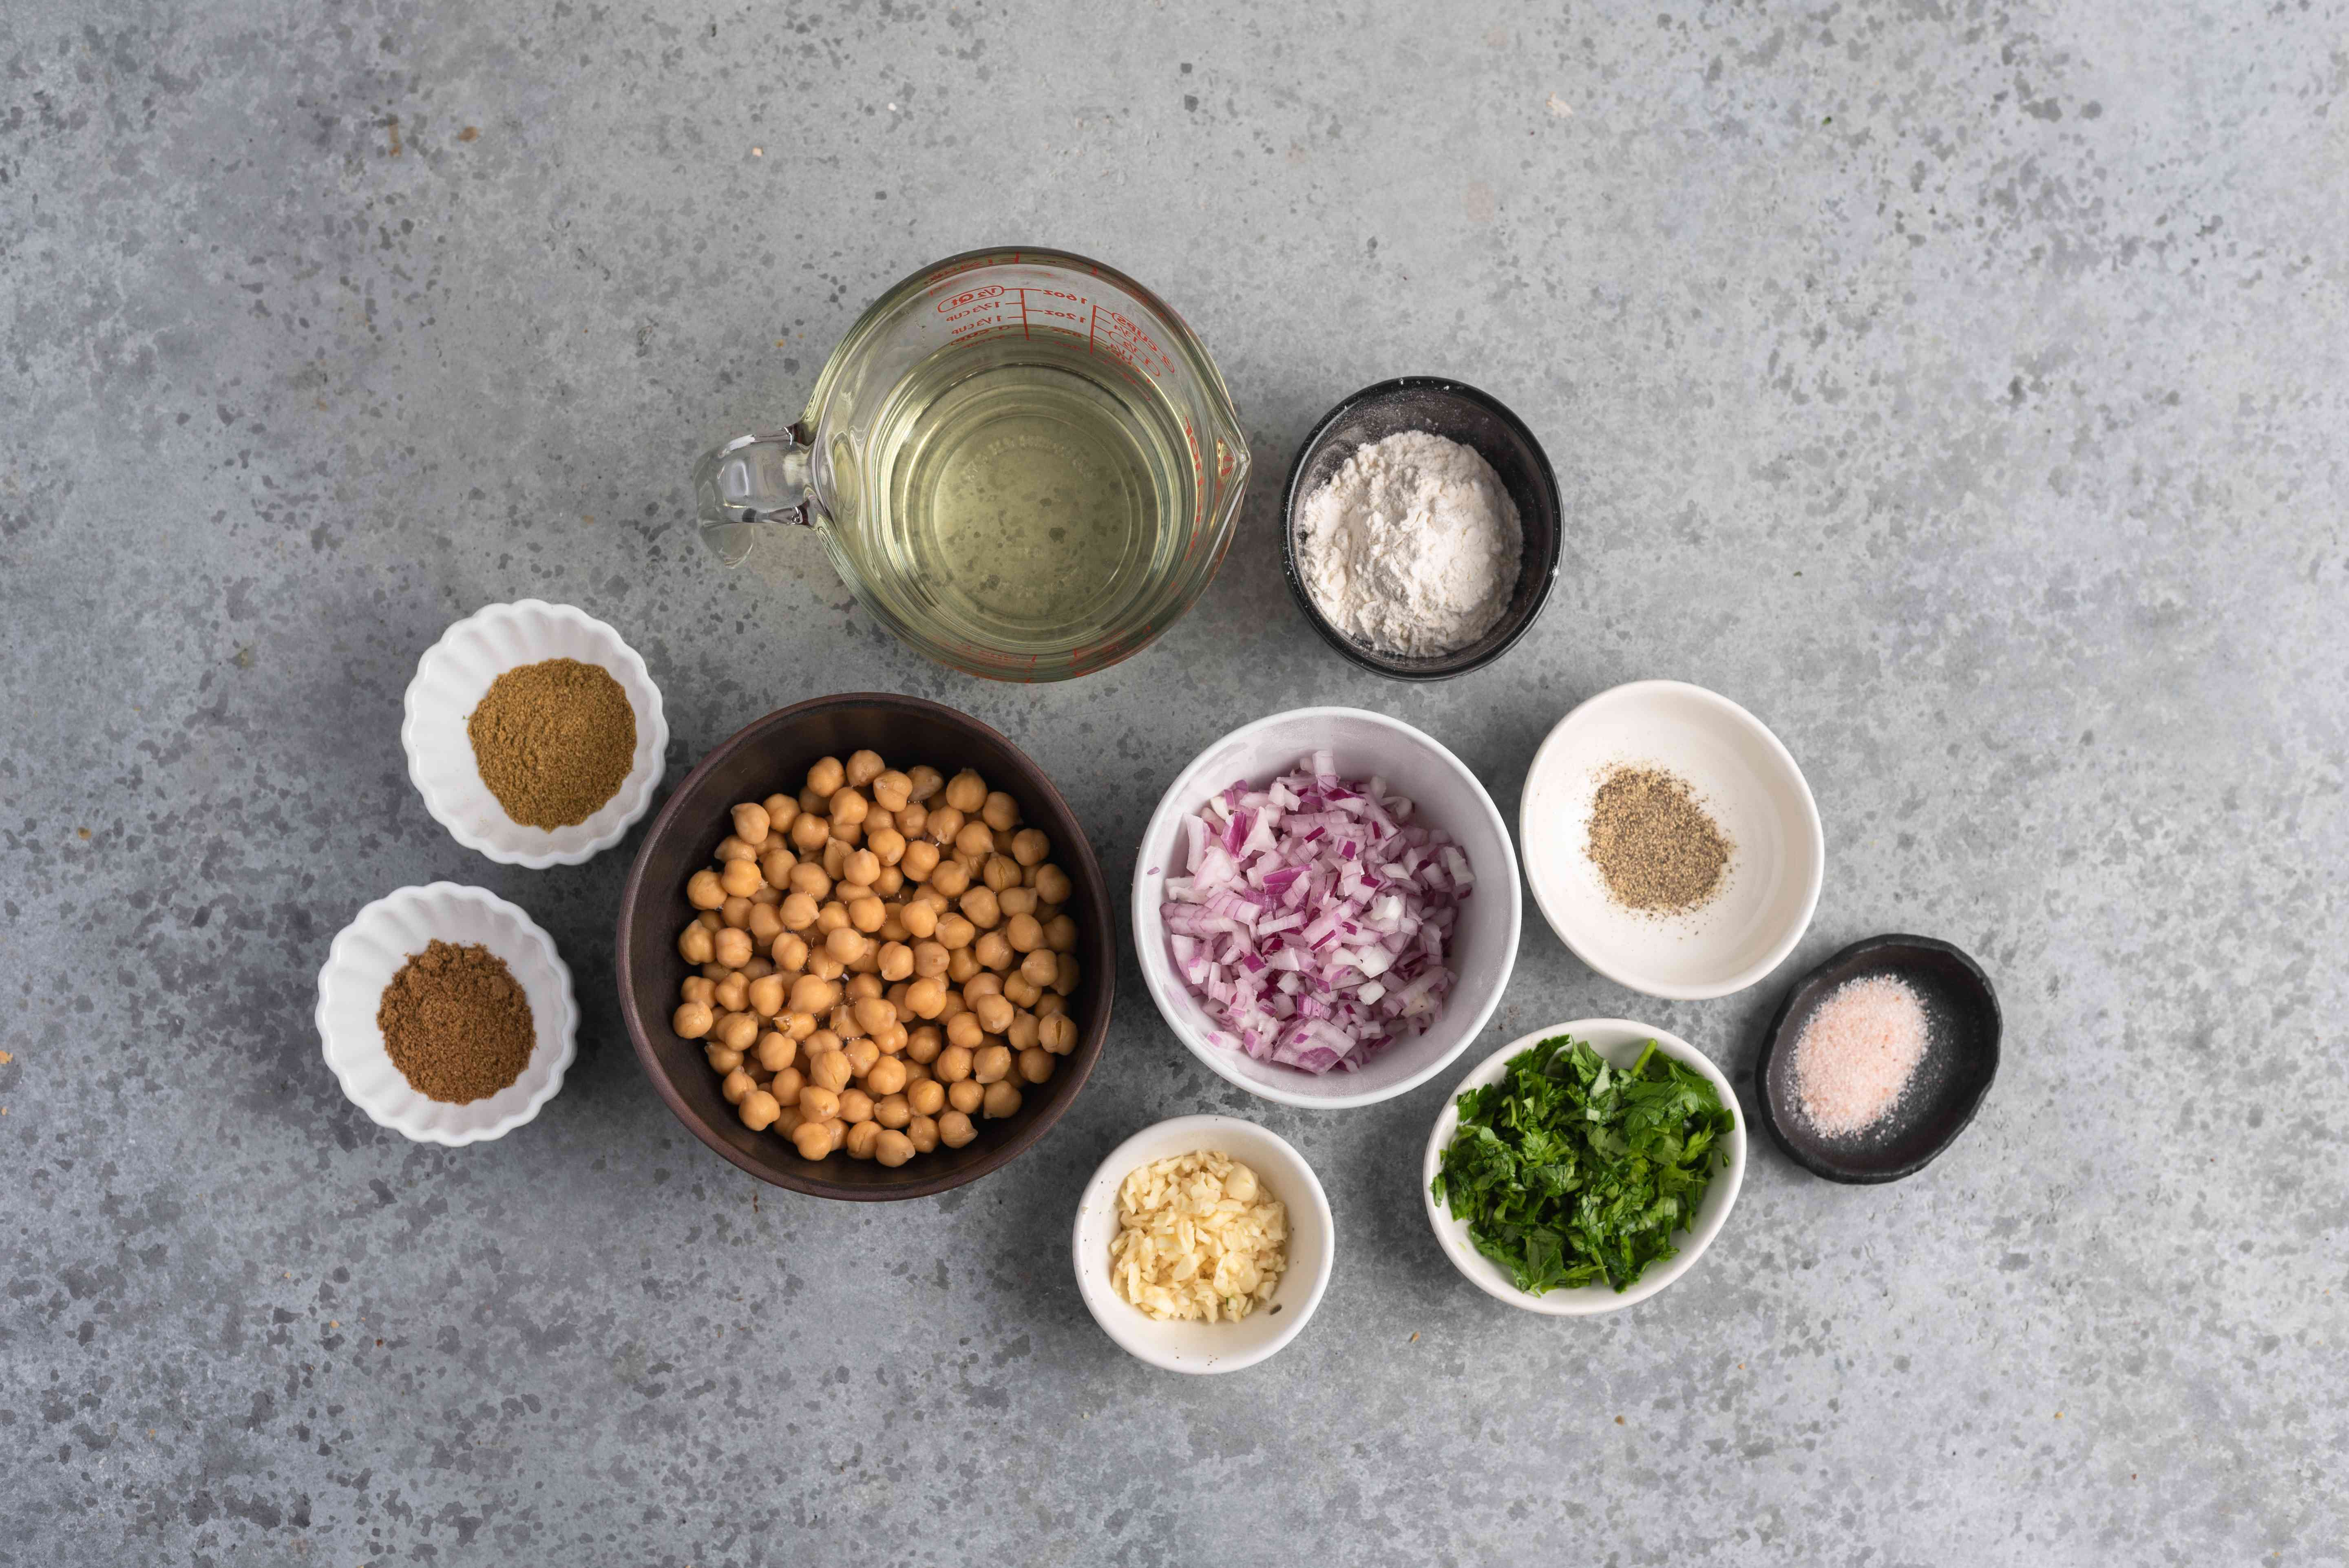 Ingredients for easy falafel recipe